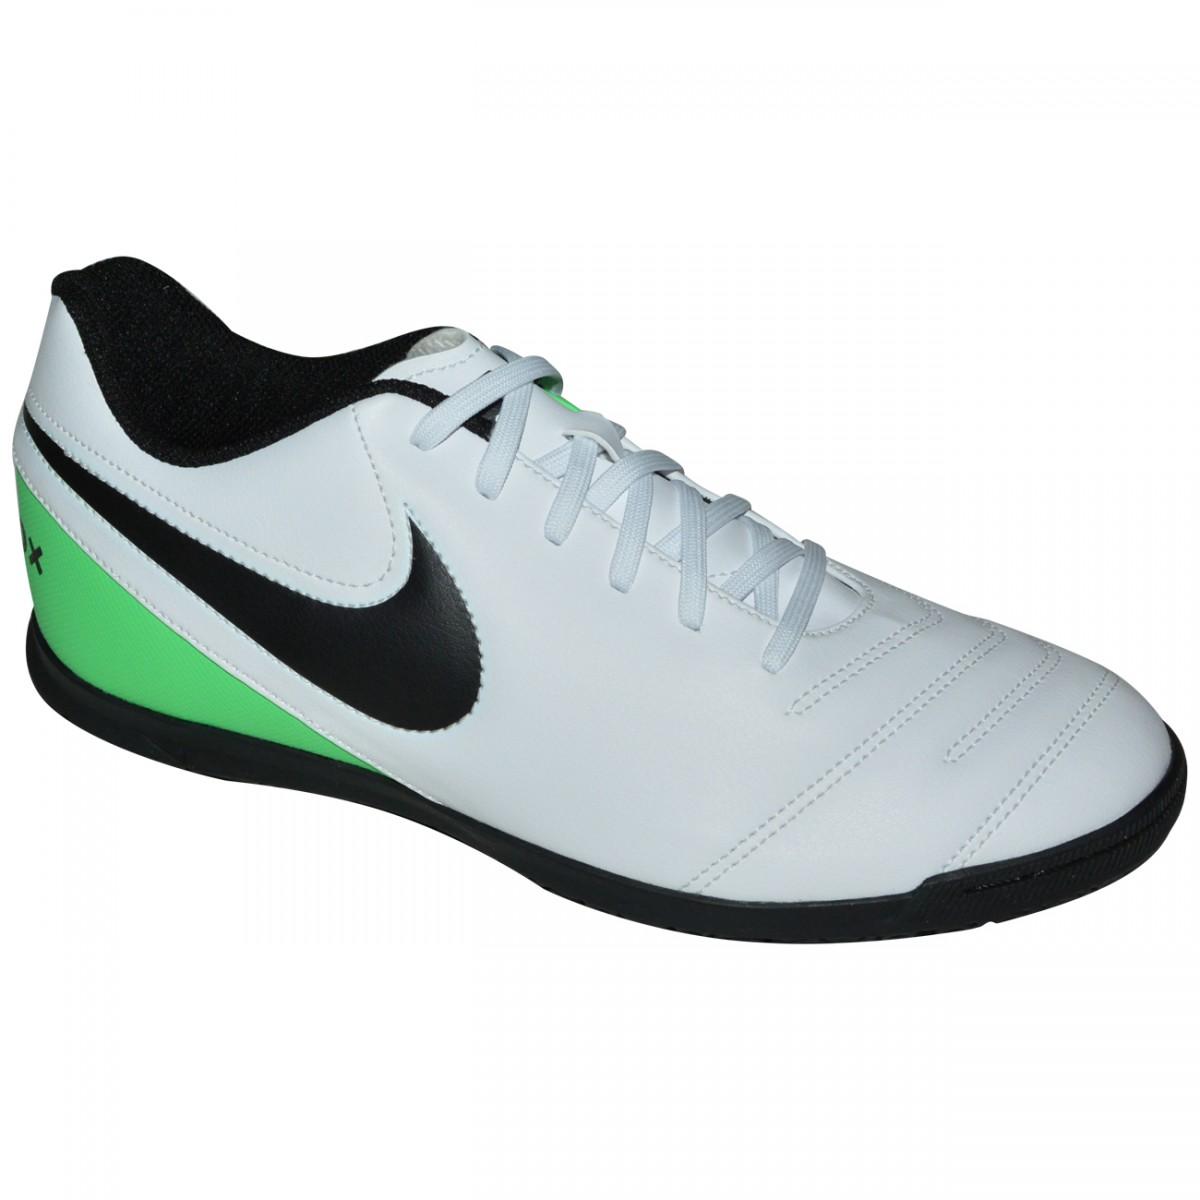 00ce9510be6 Tenis Nike Tiempox Rio III 819234 103 - Branco Preto Verde - Chuteira Nike